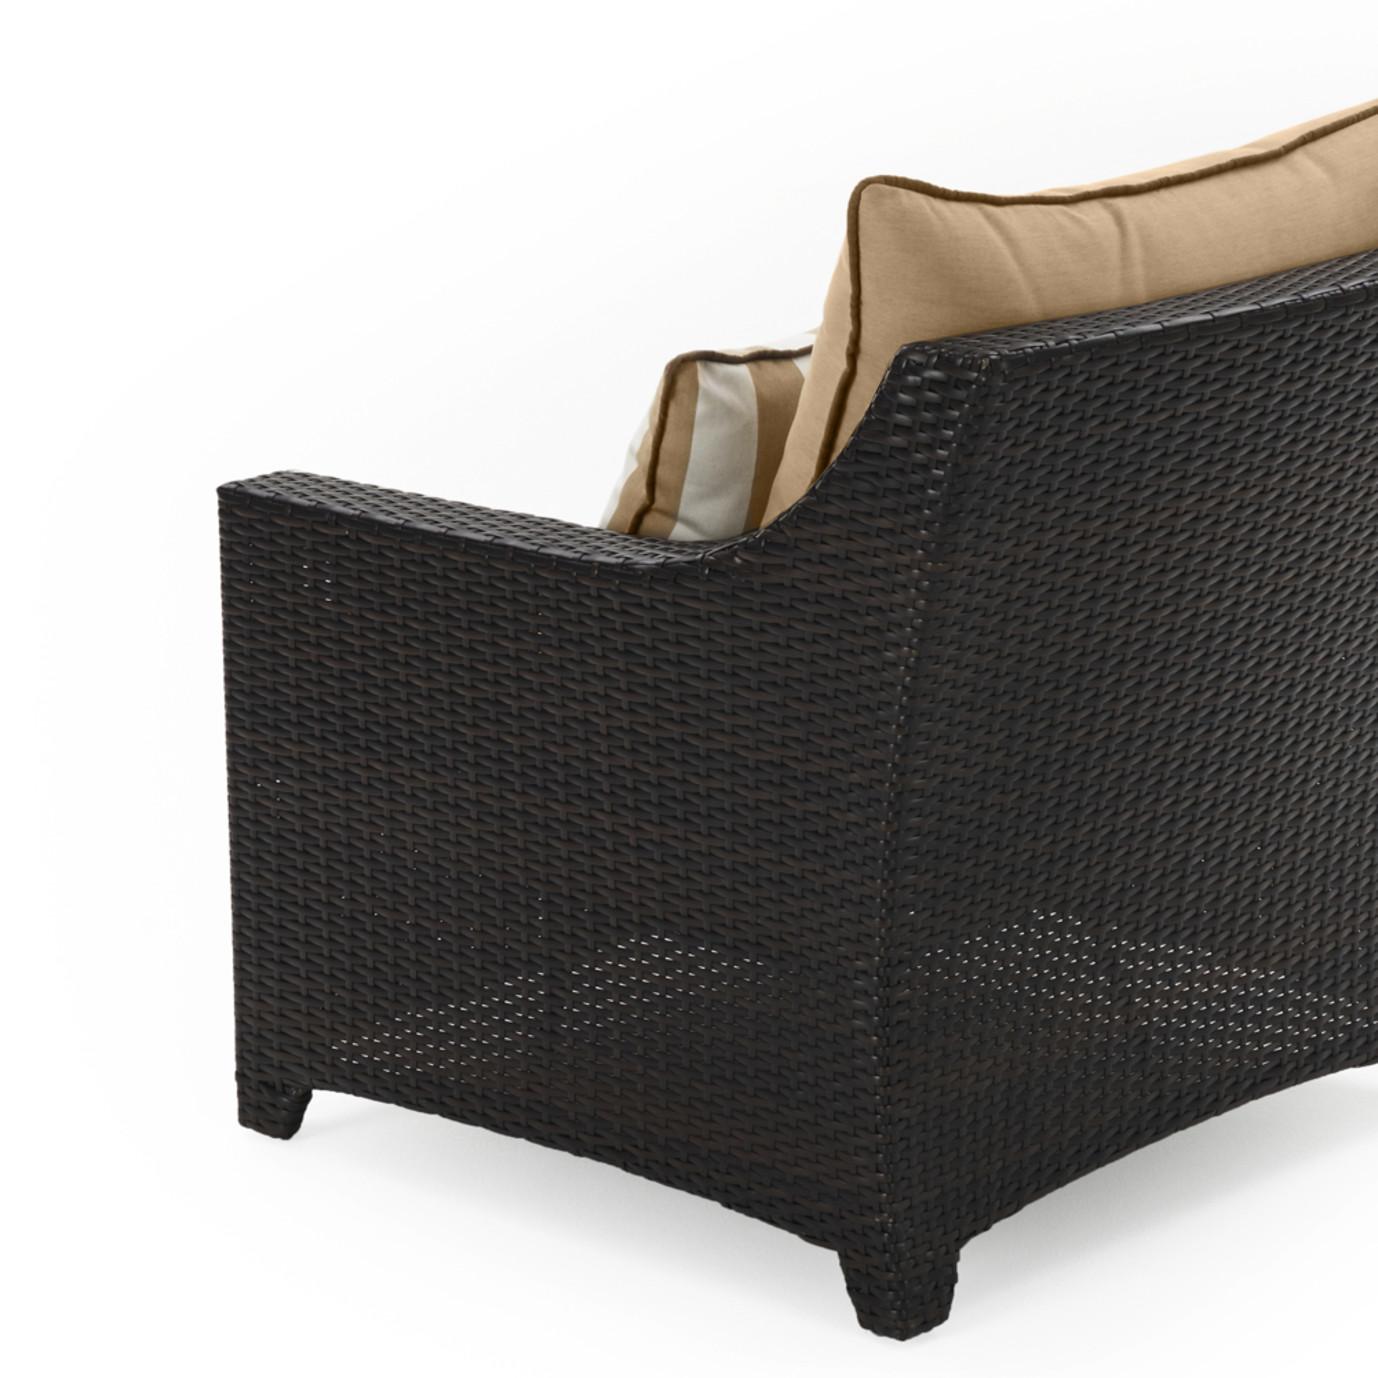 Deco™ Sofa & Coffee Table - Maxim Beige